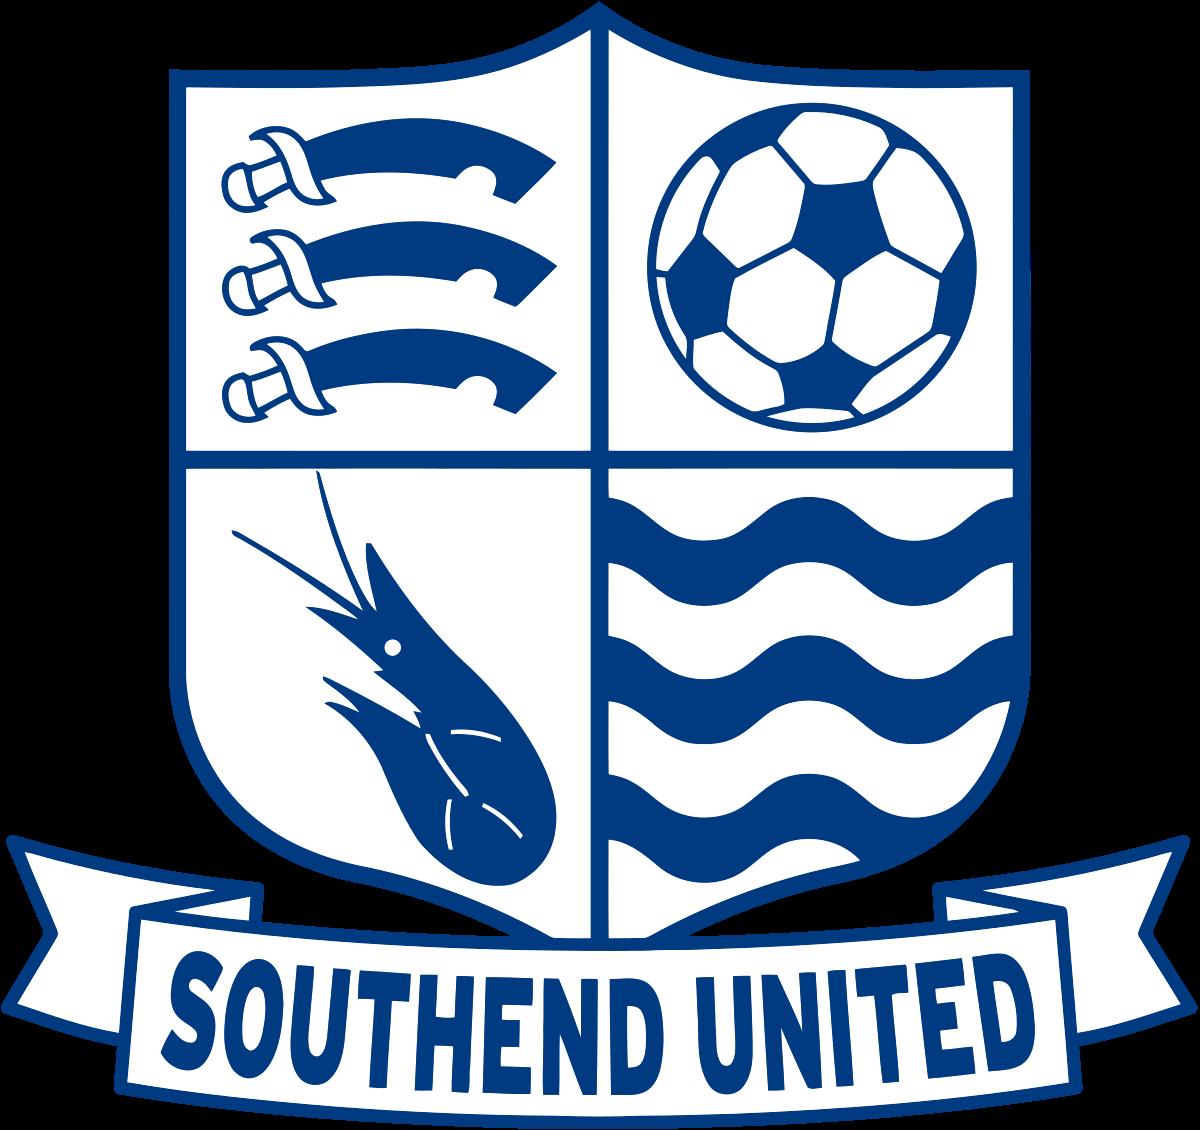 Southend United Football Club